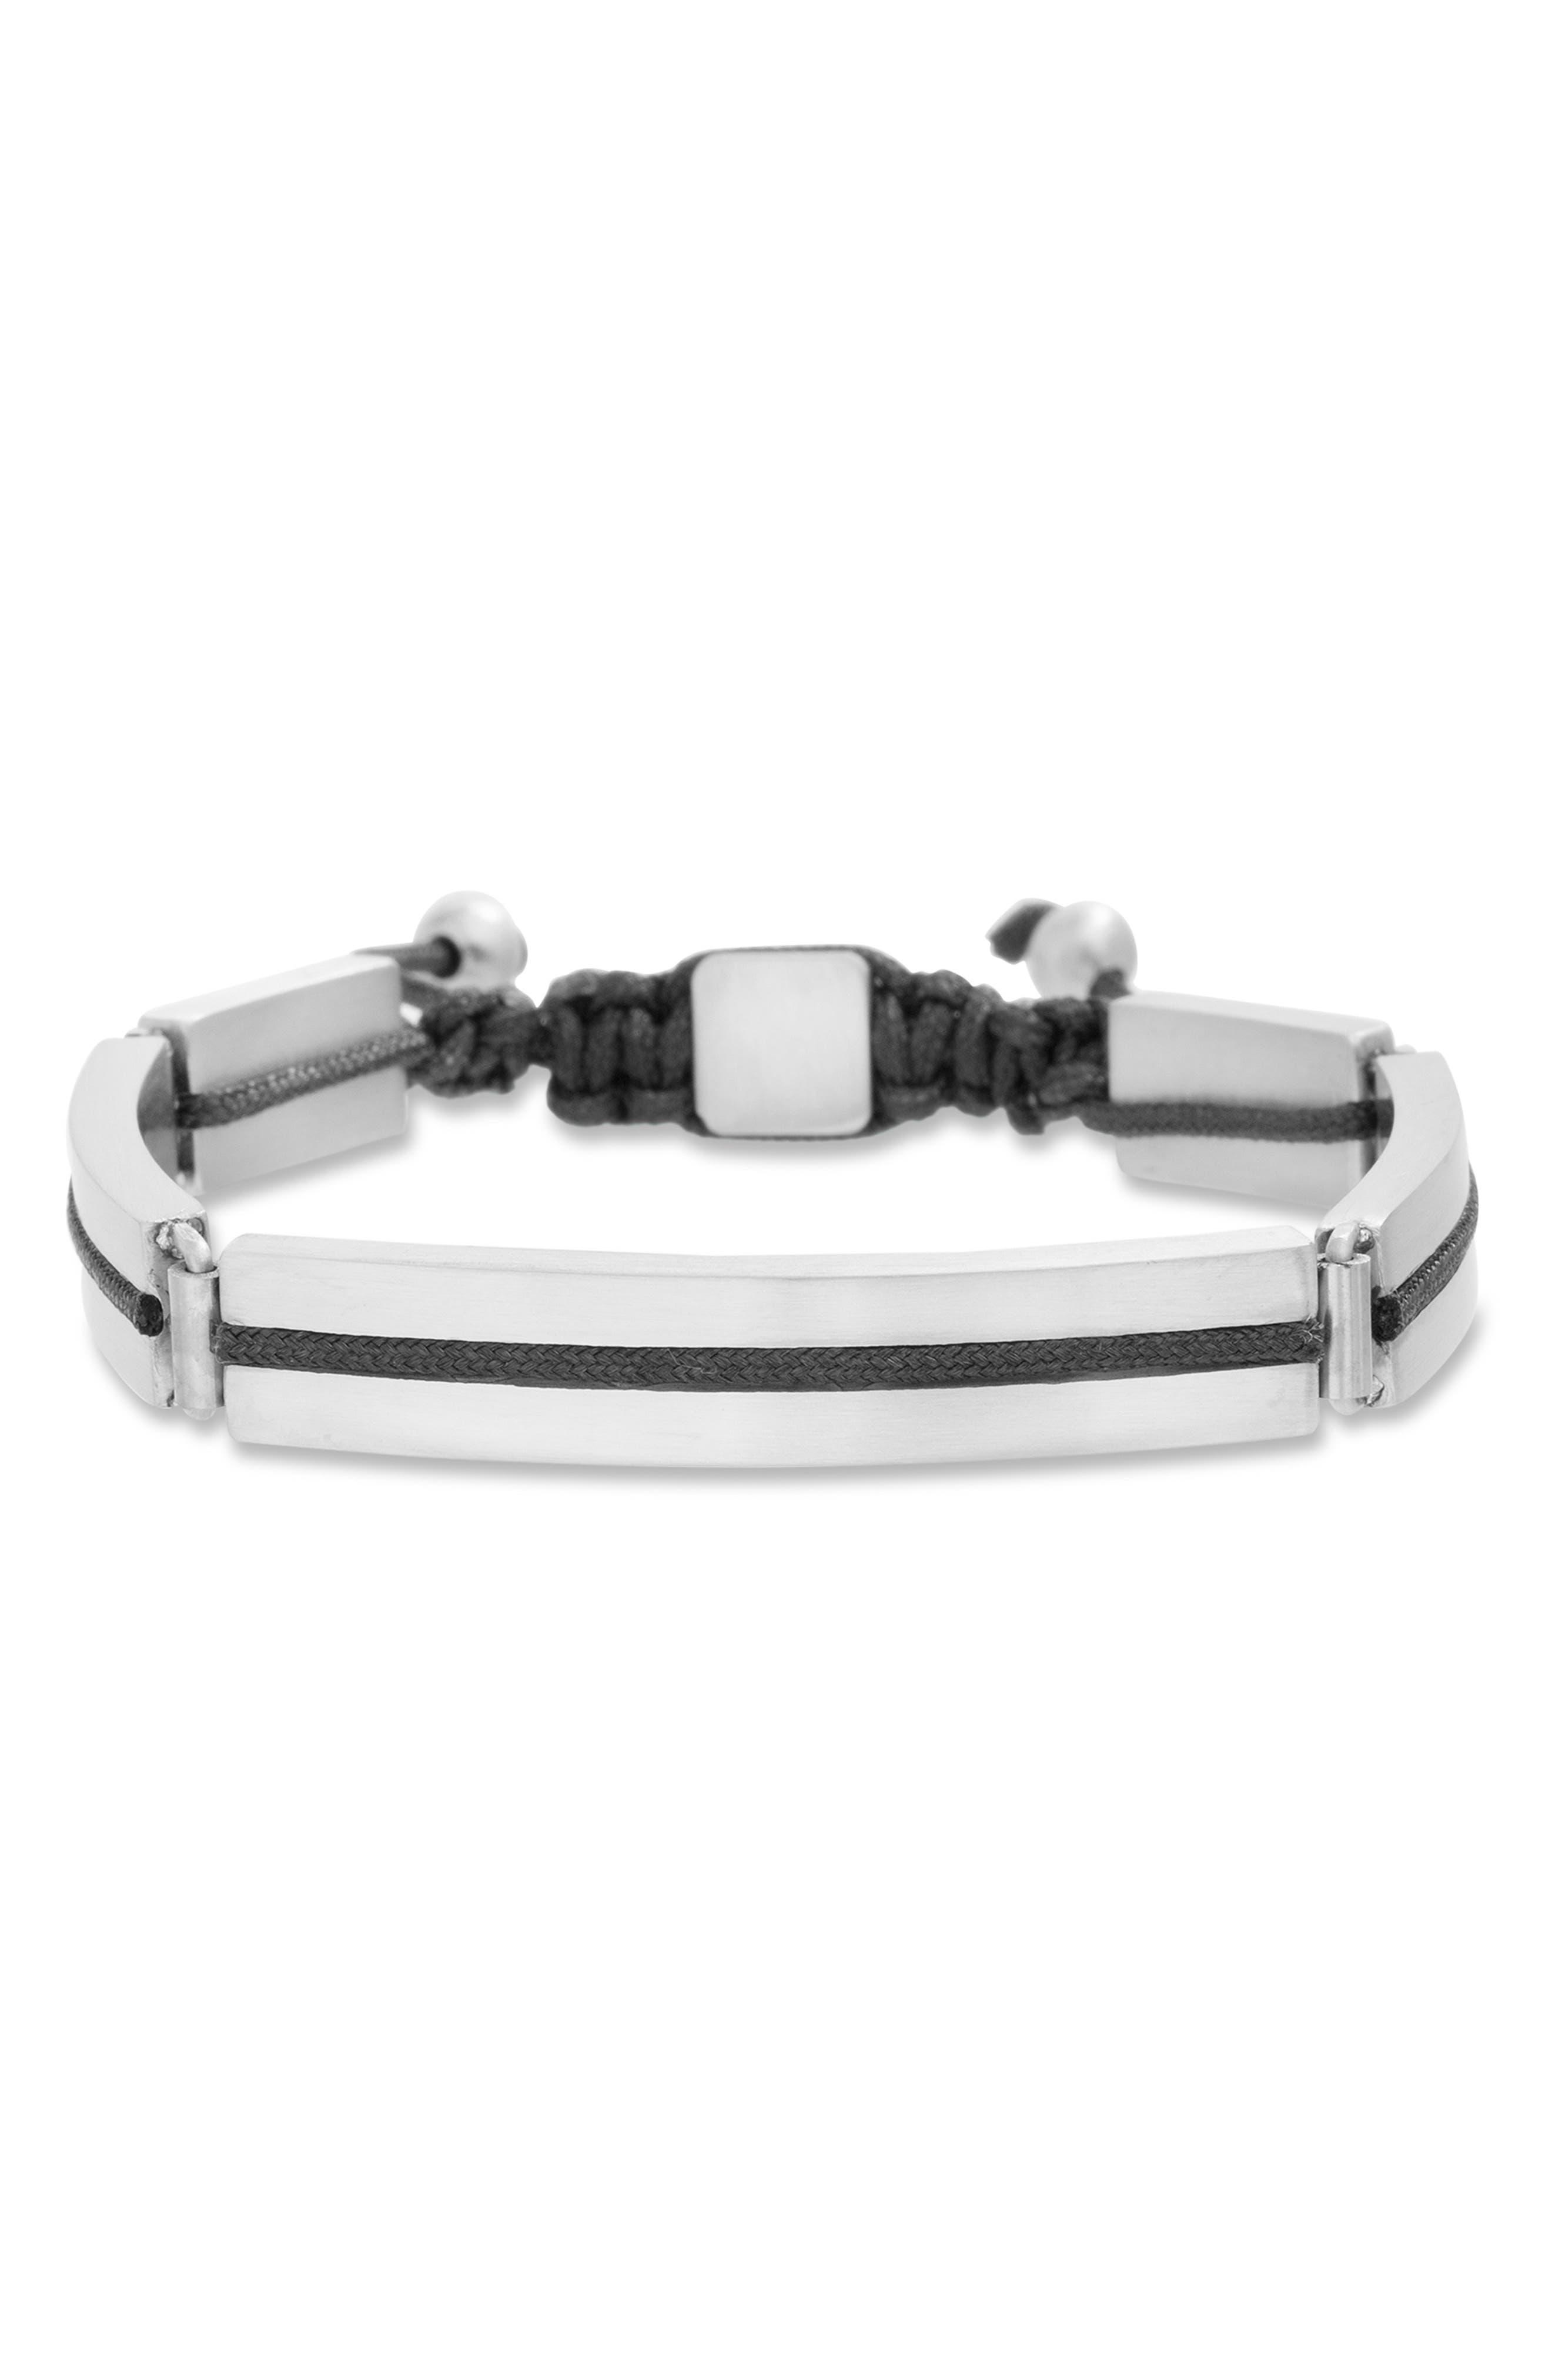 BEN SHERMAN Adjustable Steel Bracelet in White